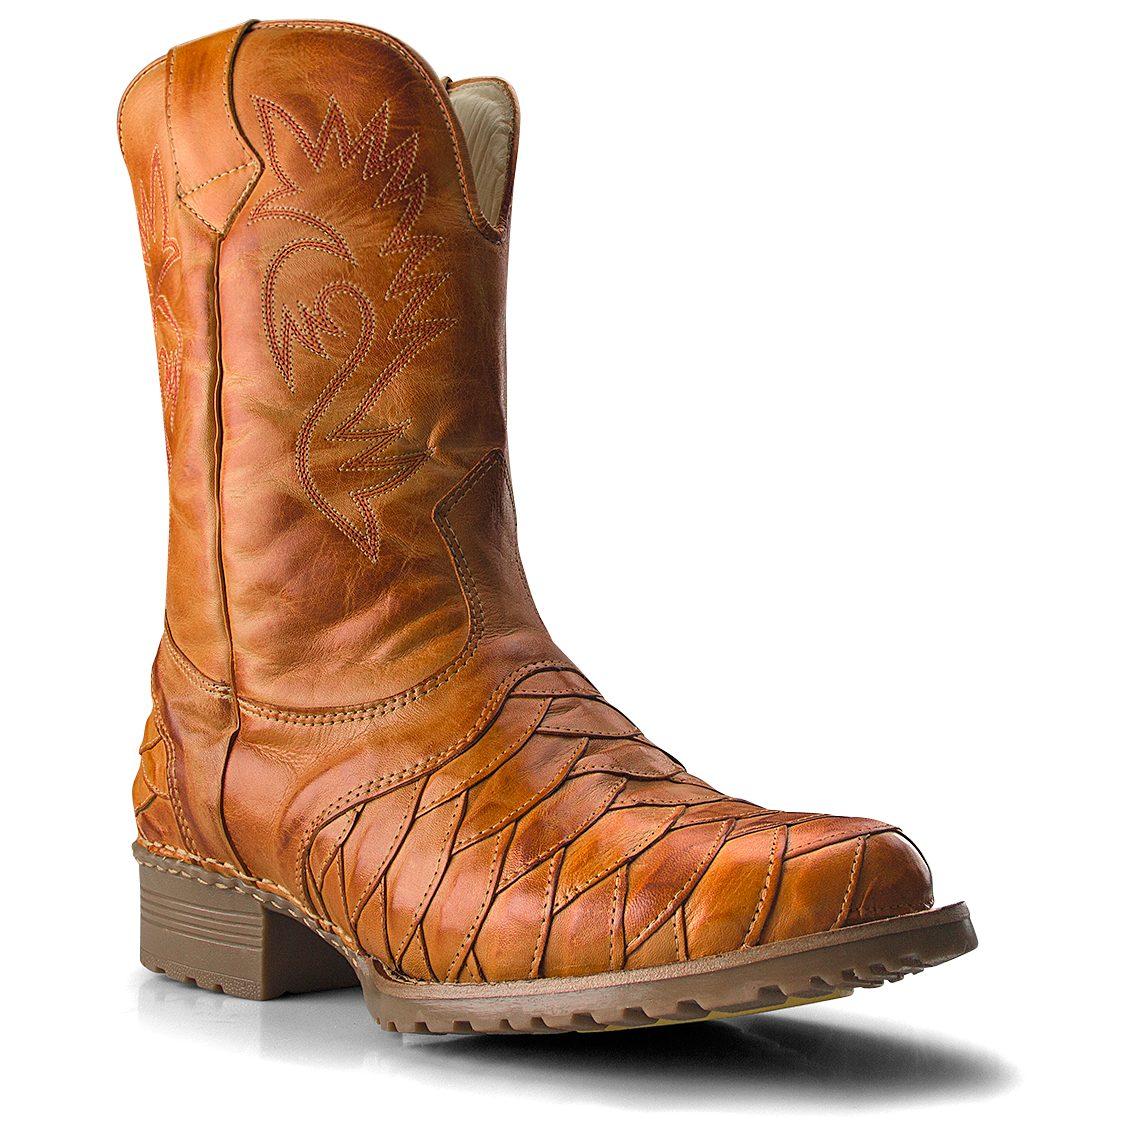 3c8dcc108f bota masculina country cano longo texana rodeio couro nobre. Carregando zoom .